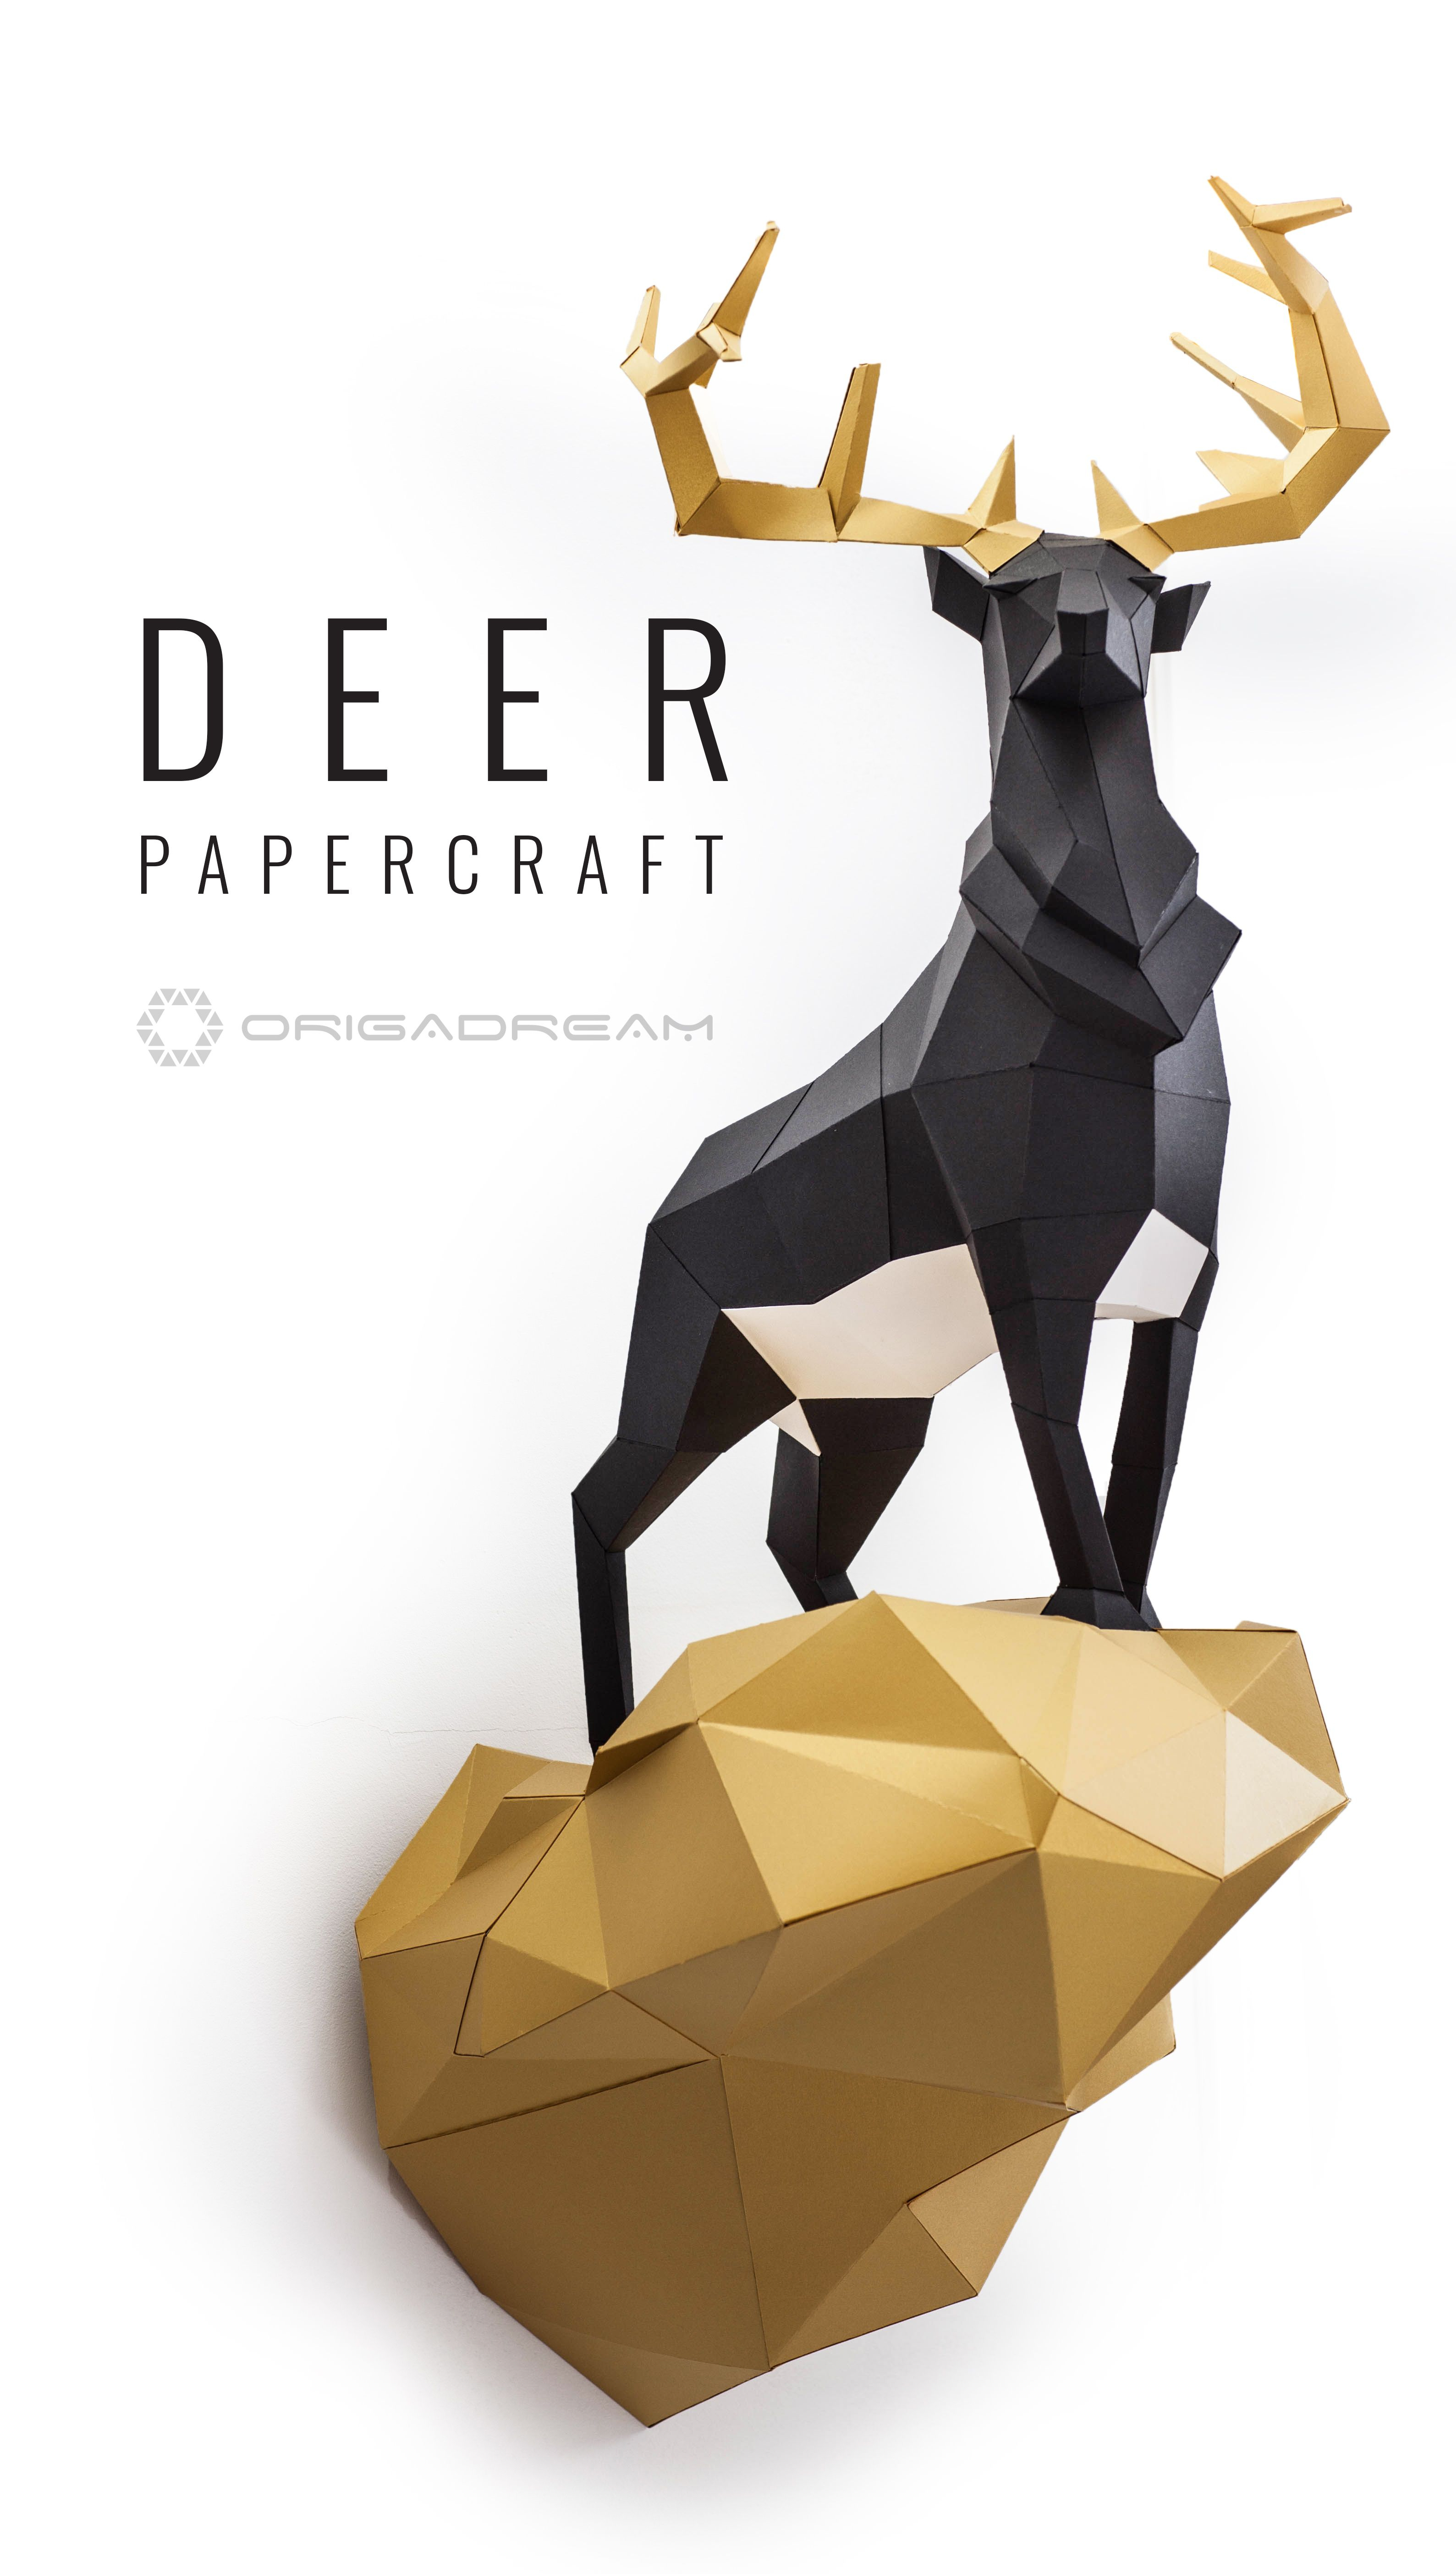 Deer #papercraft #paper #craft #diy #sculpture #decor #homedecor - Printable Origami Puzzle